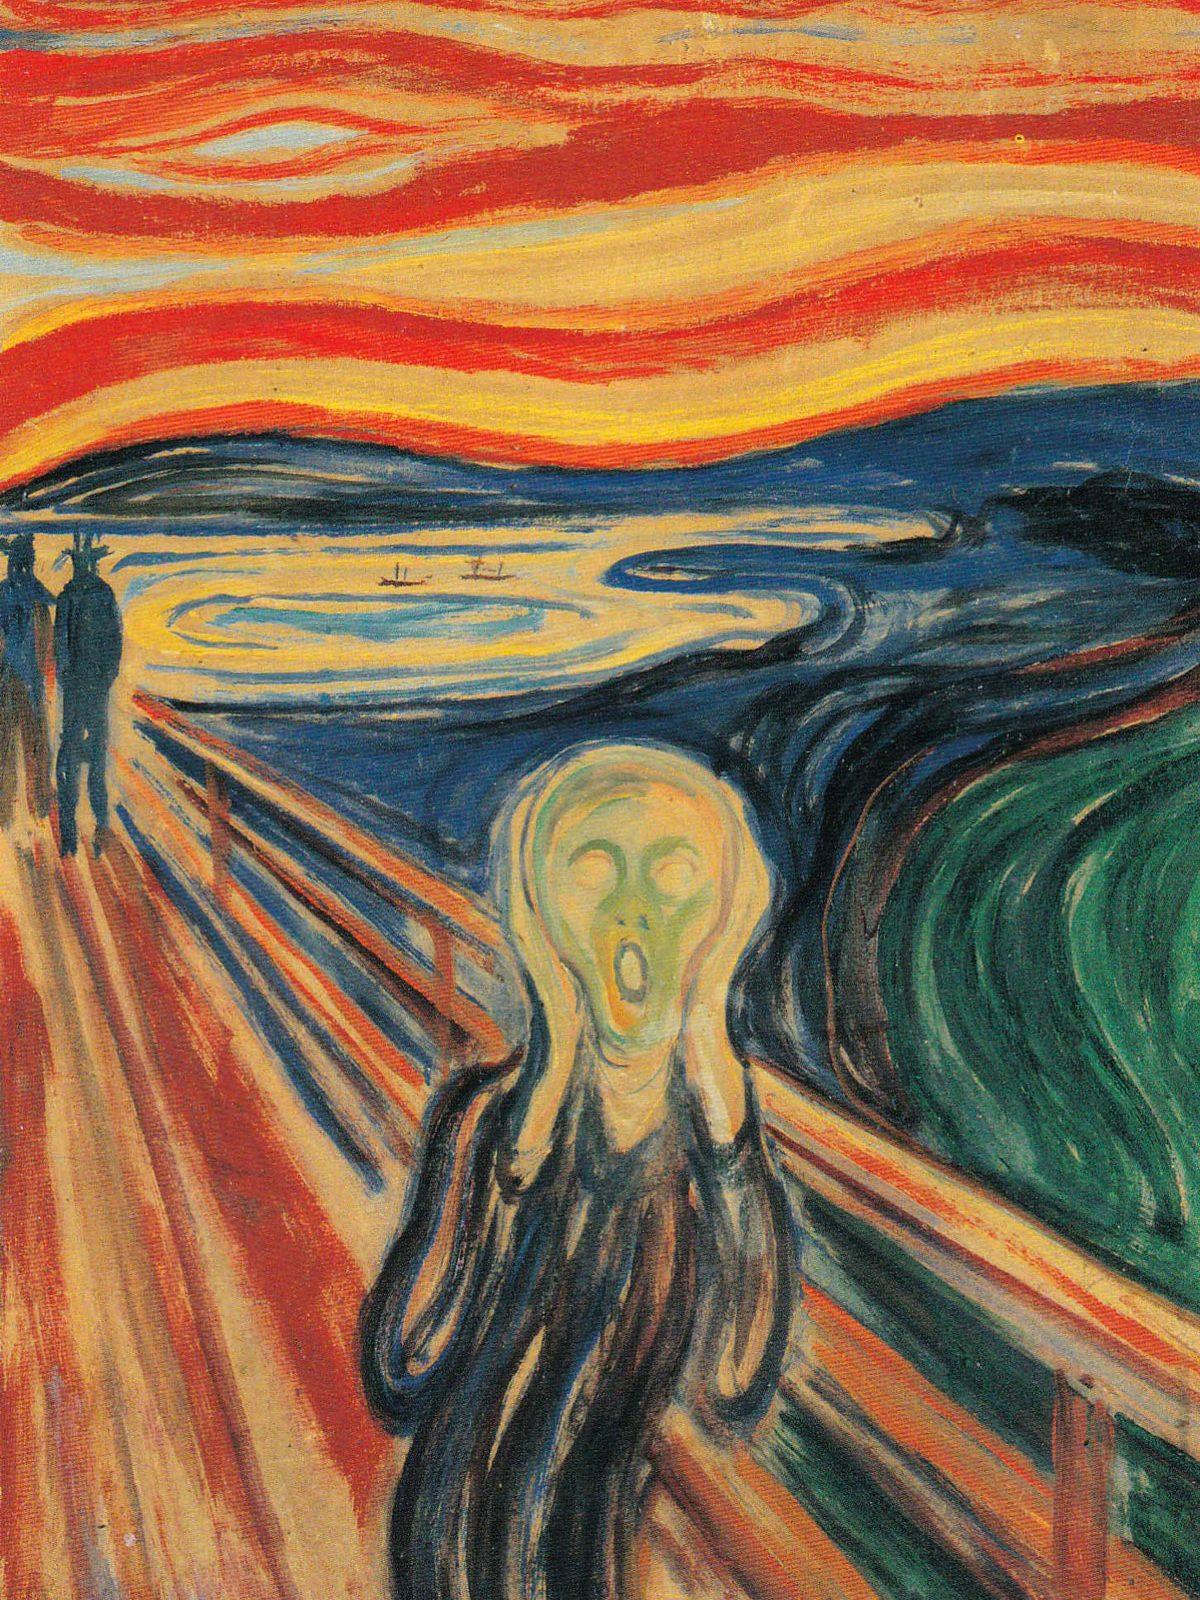 Postcard of 'The Scream'